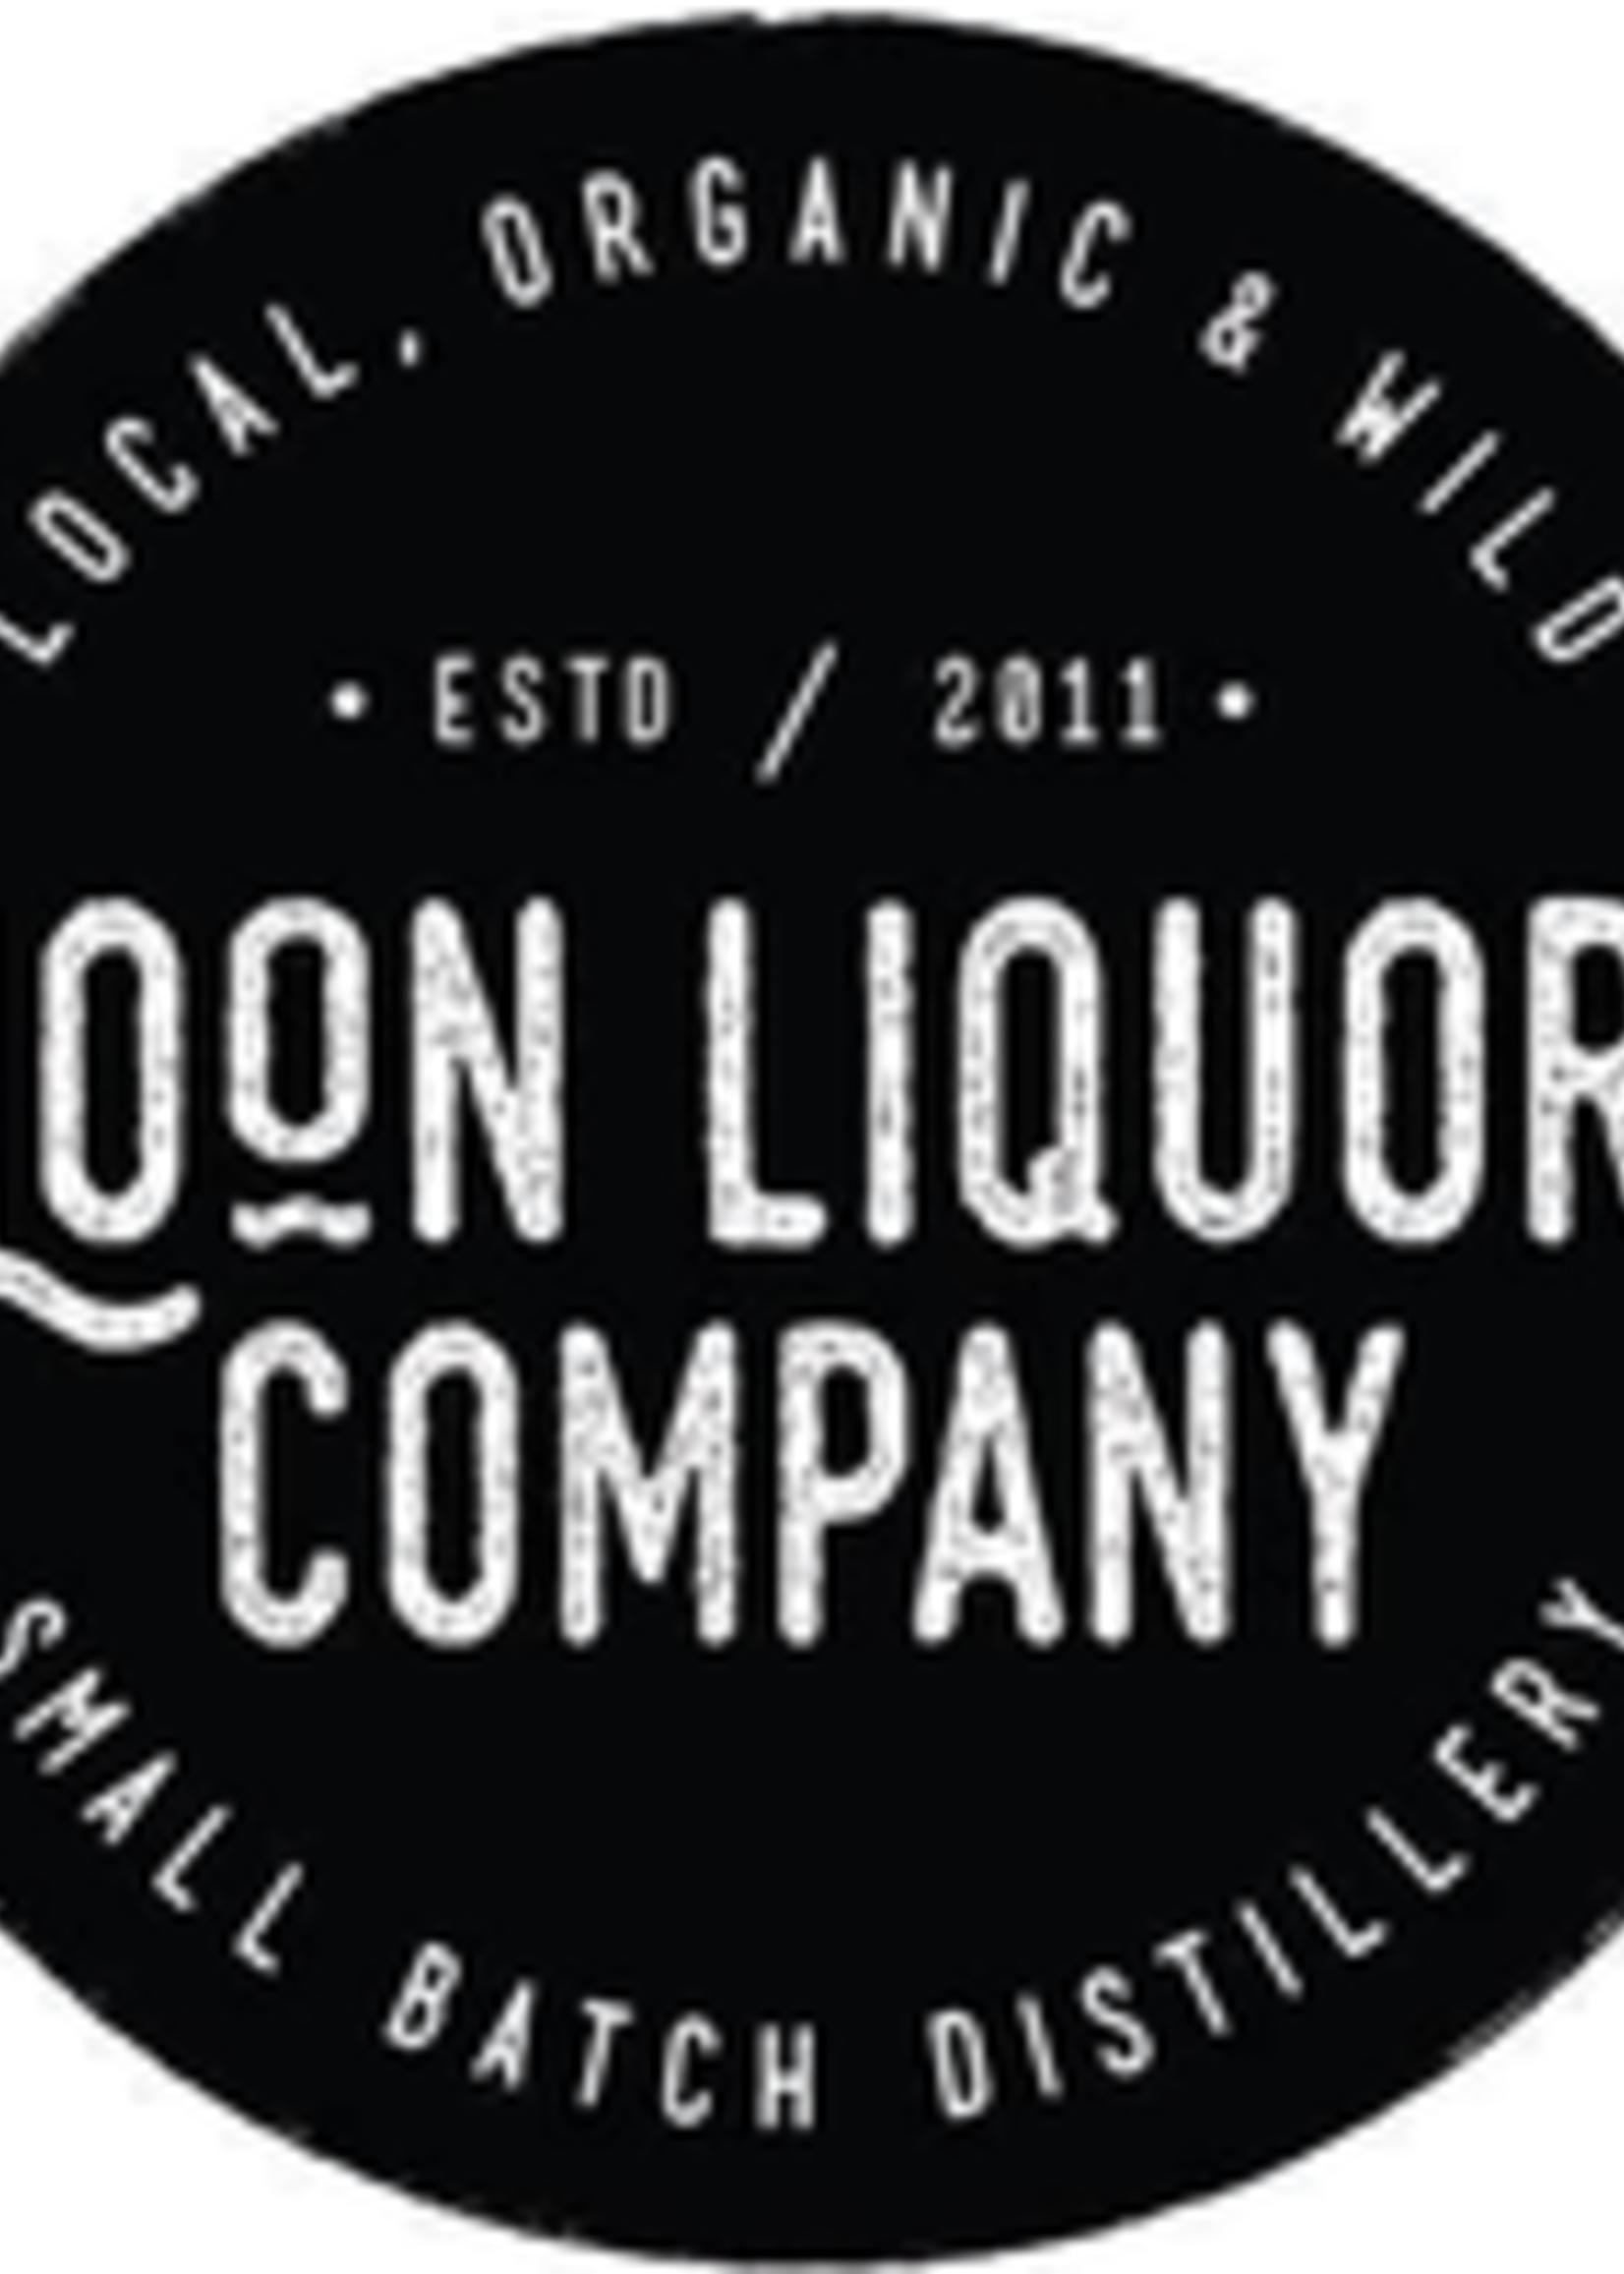 Loon Liquor Loonman Vodka - 750ml